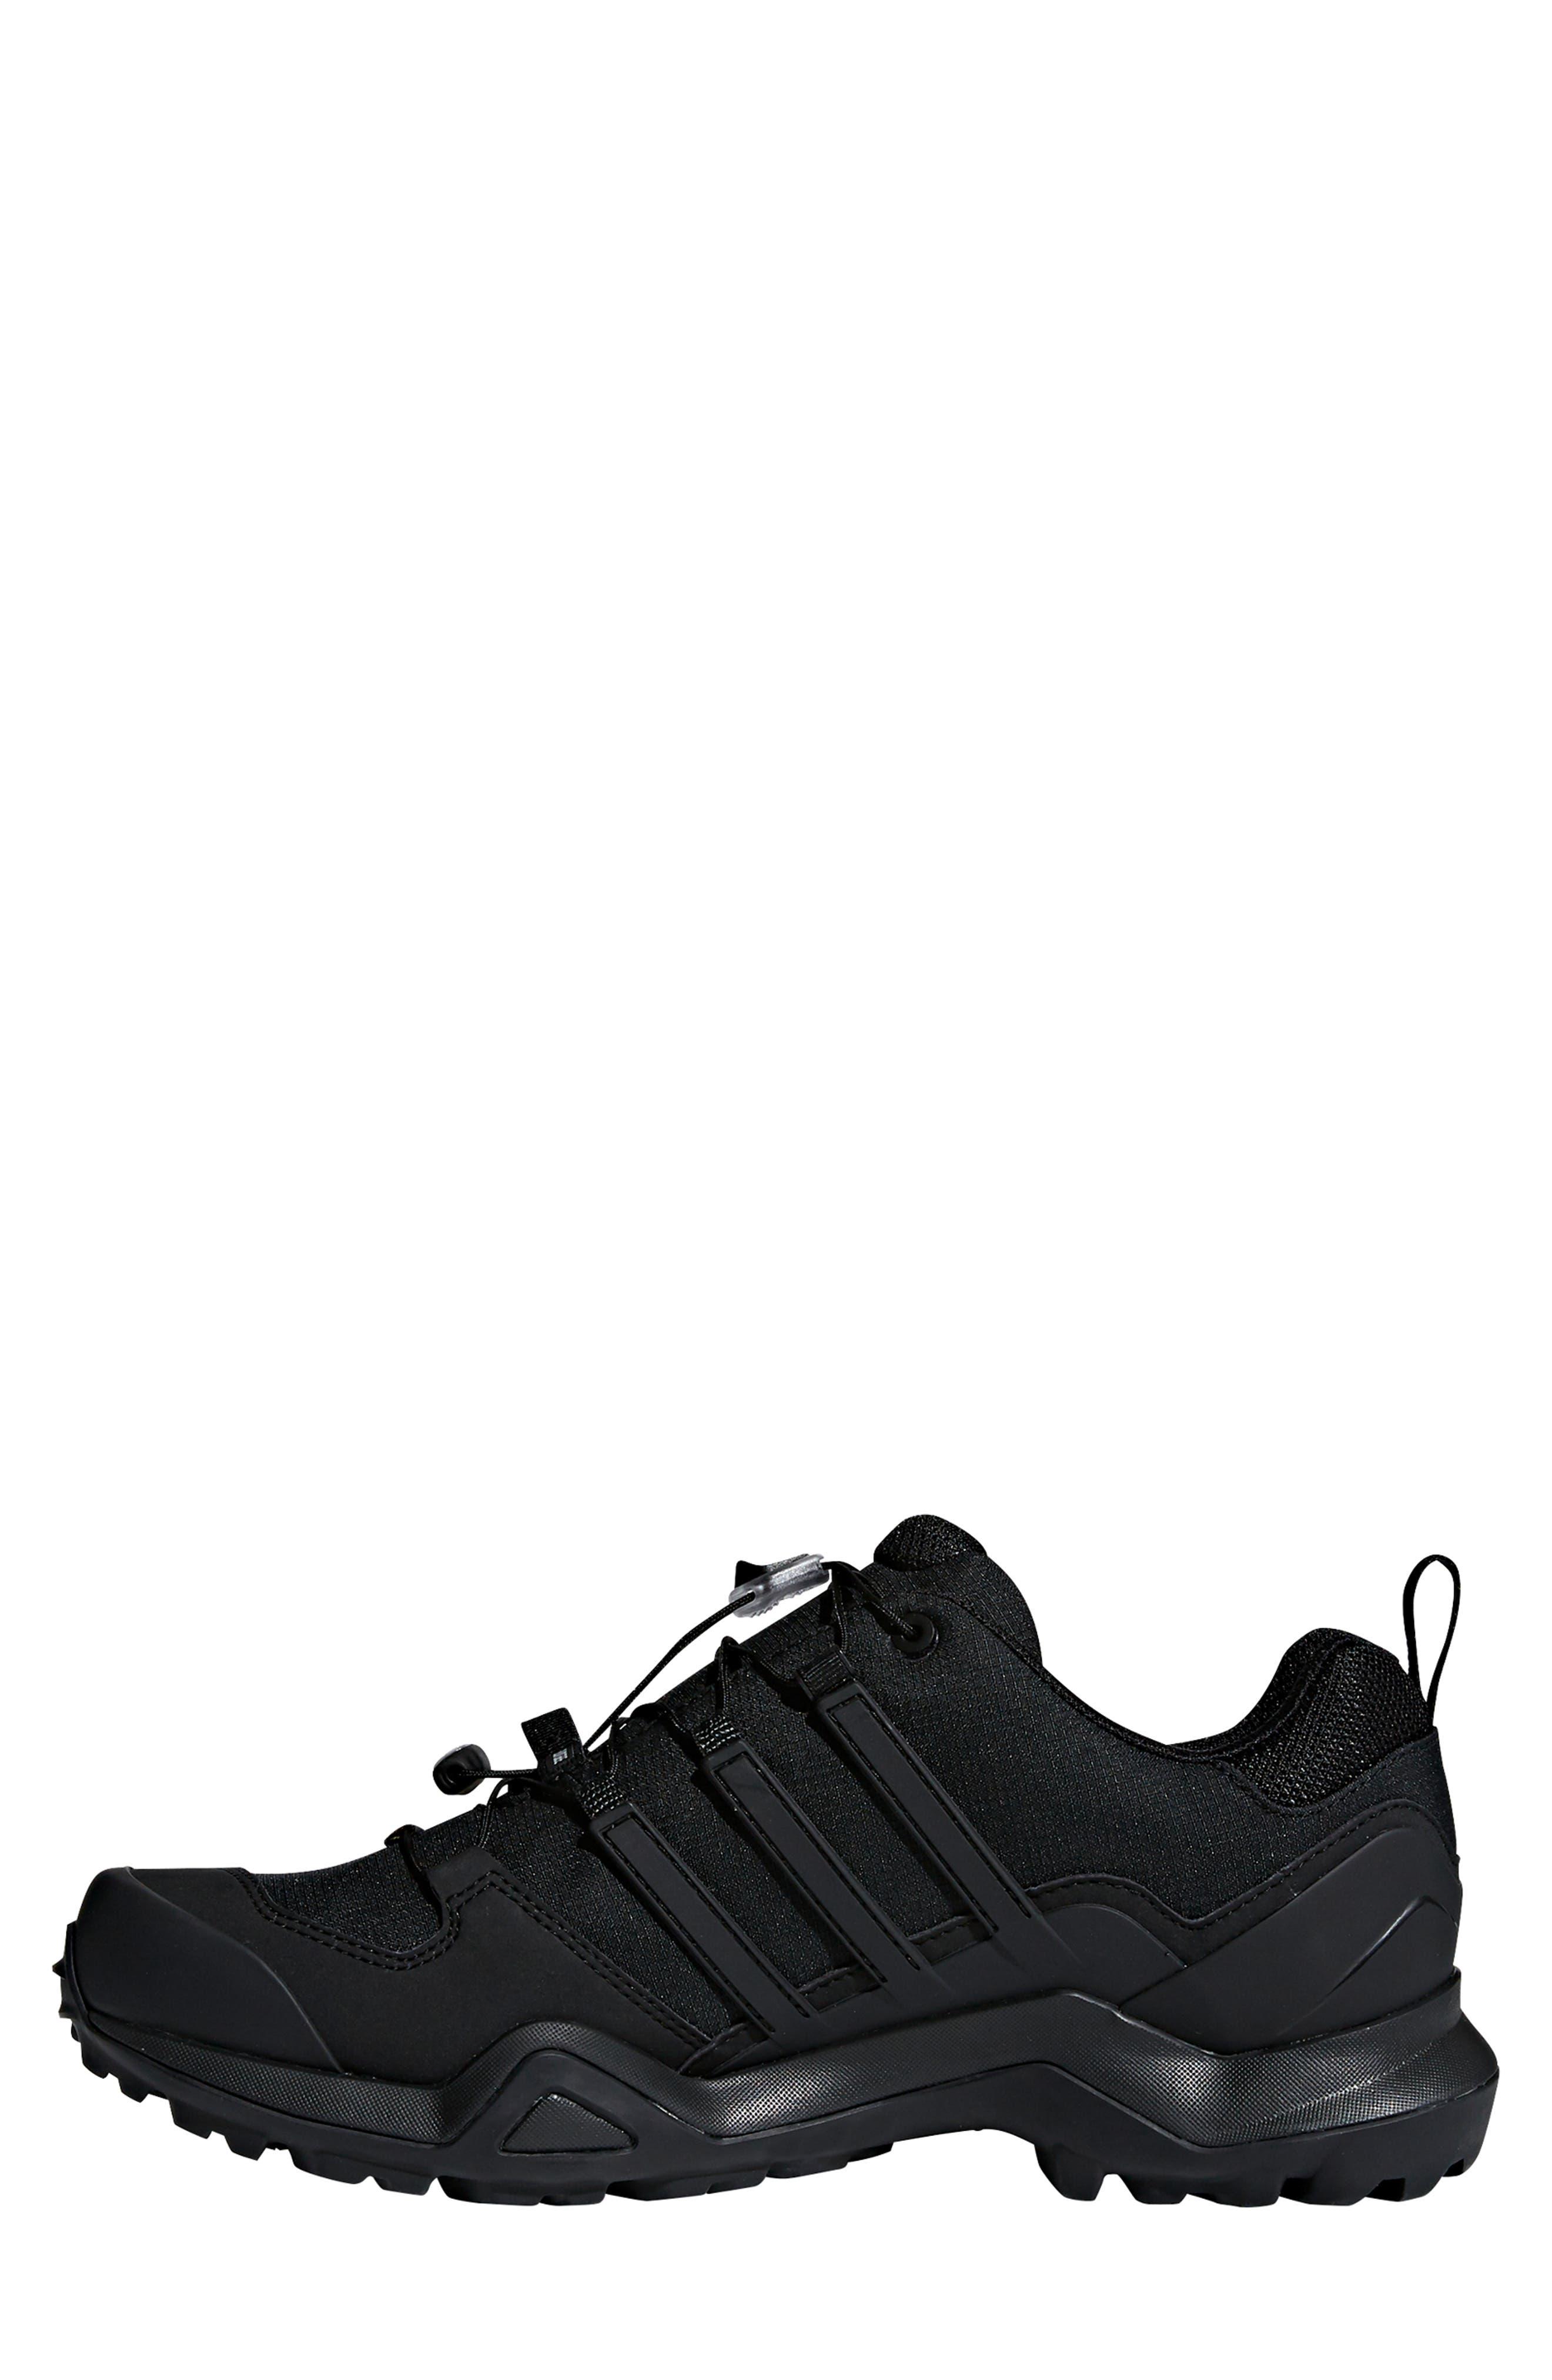 ADIDAS,                             Terrex Swift R2 GTX Gore-Tex<sup>®</sup> Waterproof Hiking Shoe,                             Alternate thumbnail 7, color,                             BLACK/ BLACK/ BLACK